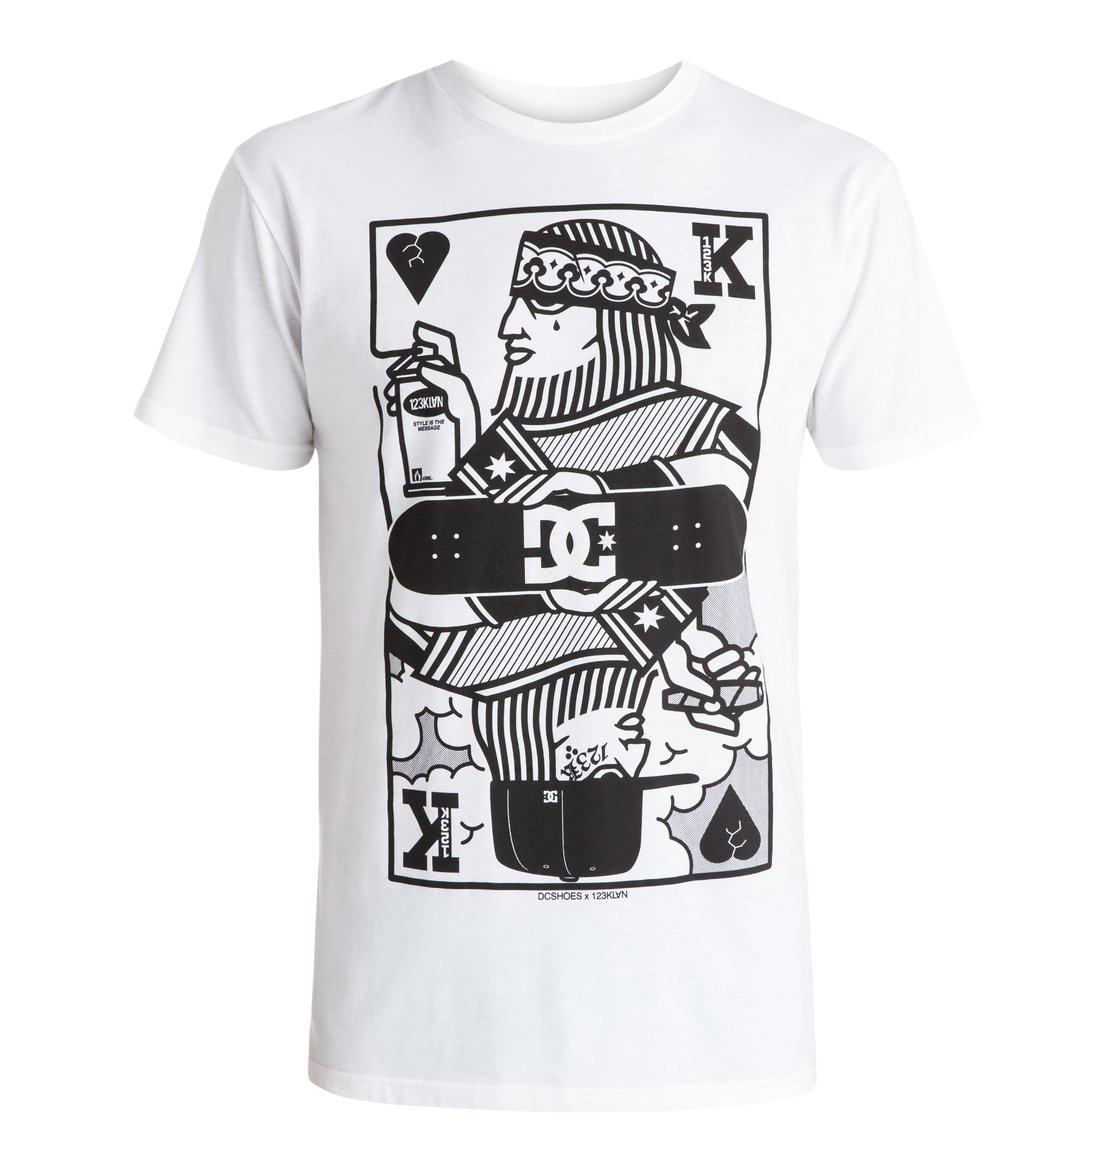 123 Kingcard T-Shirt от DC Shoes